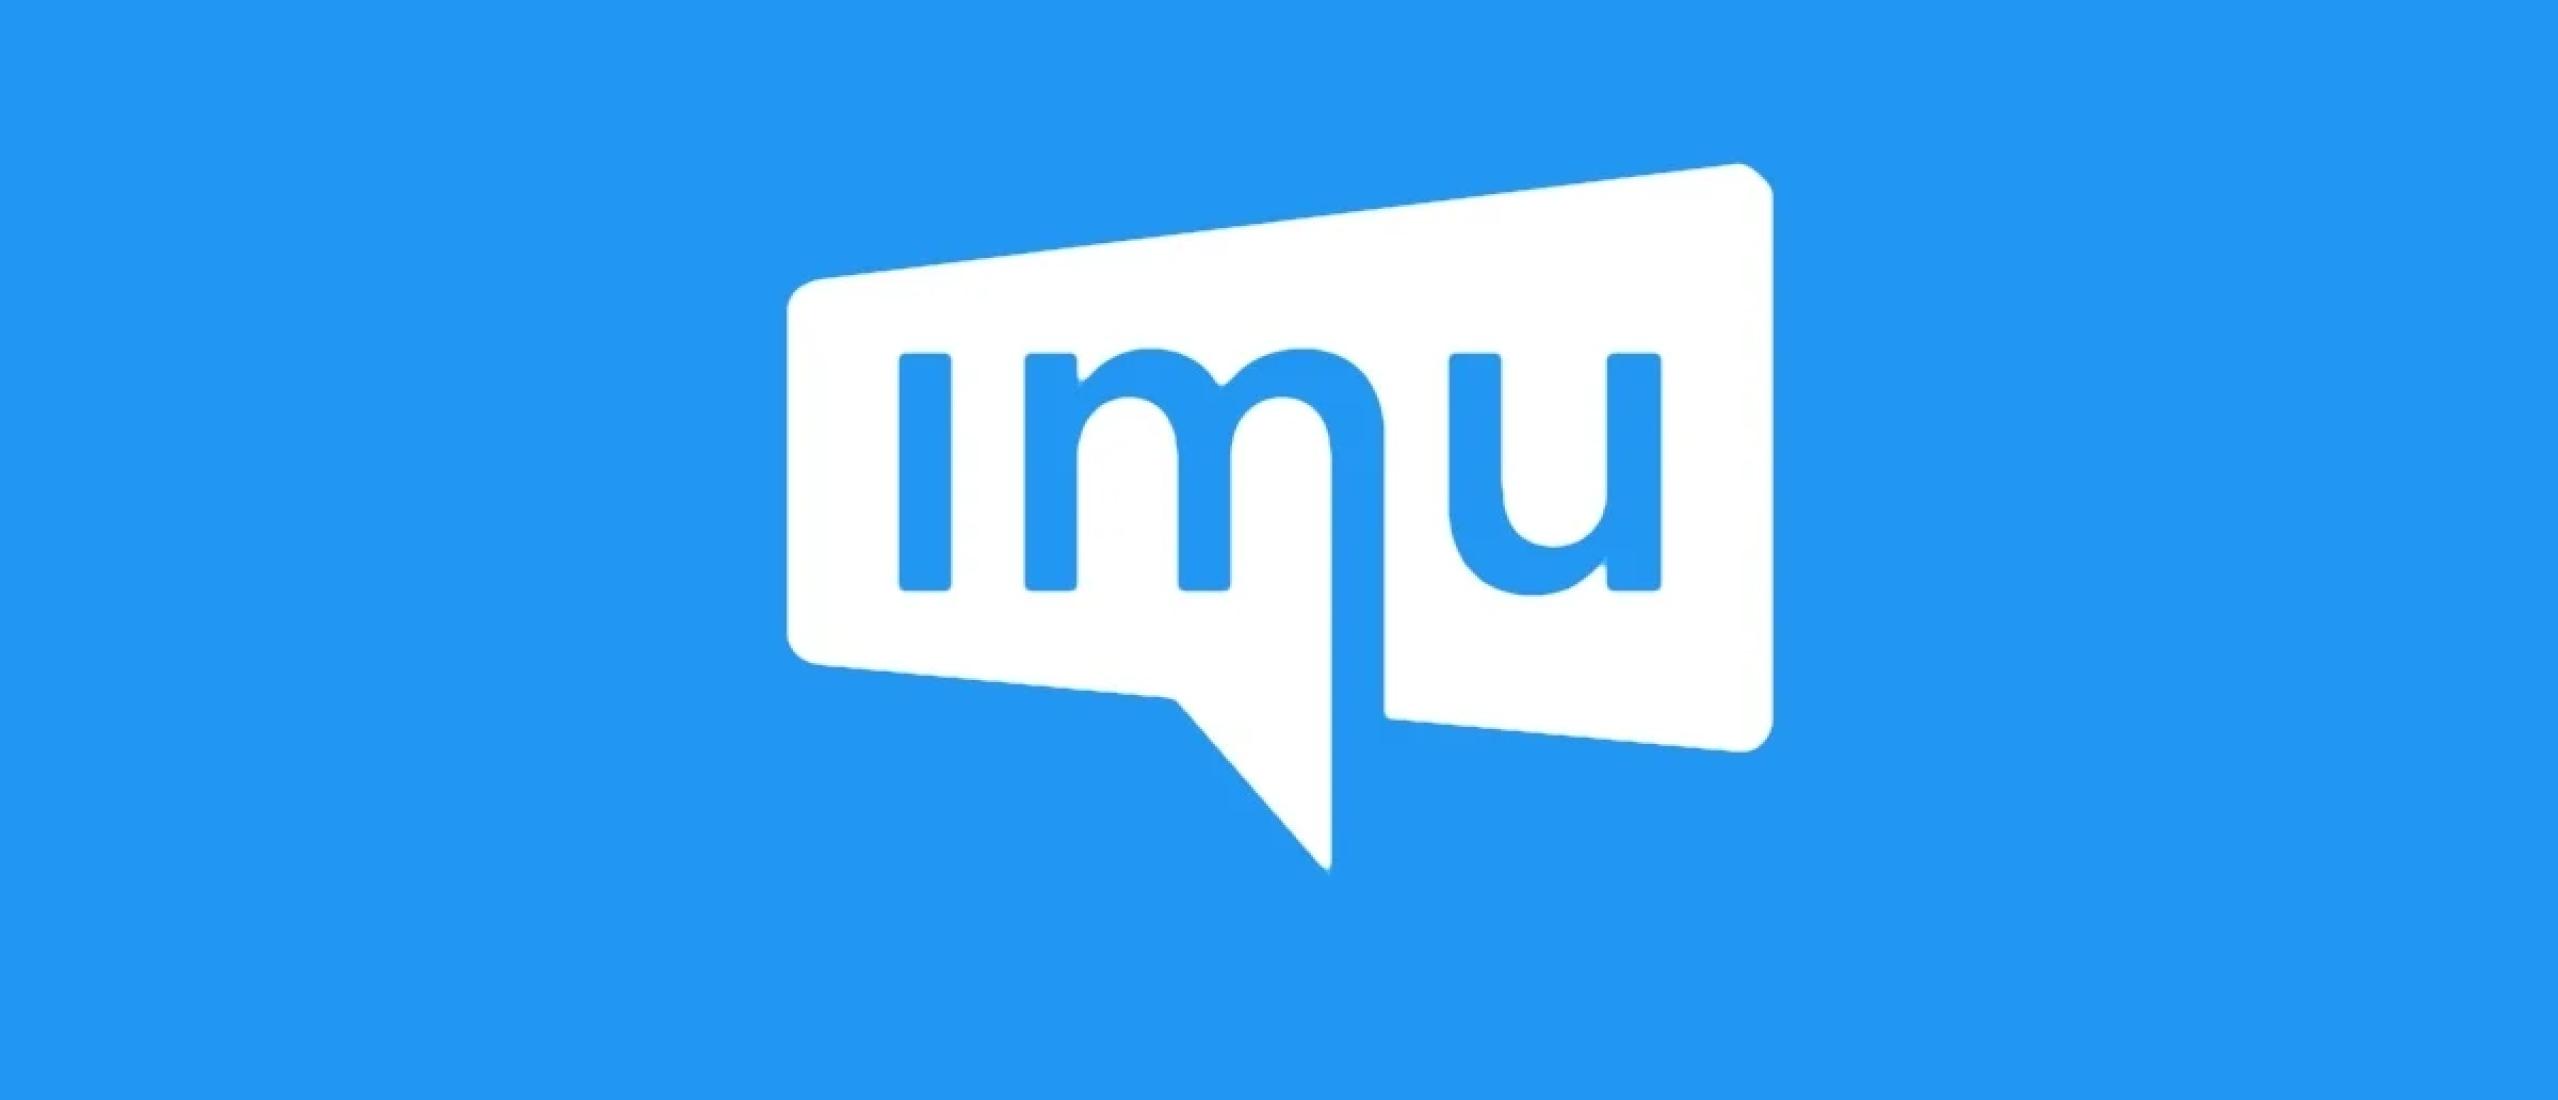 IMU Premium review